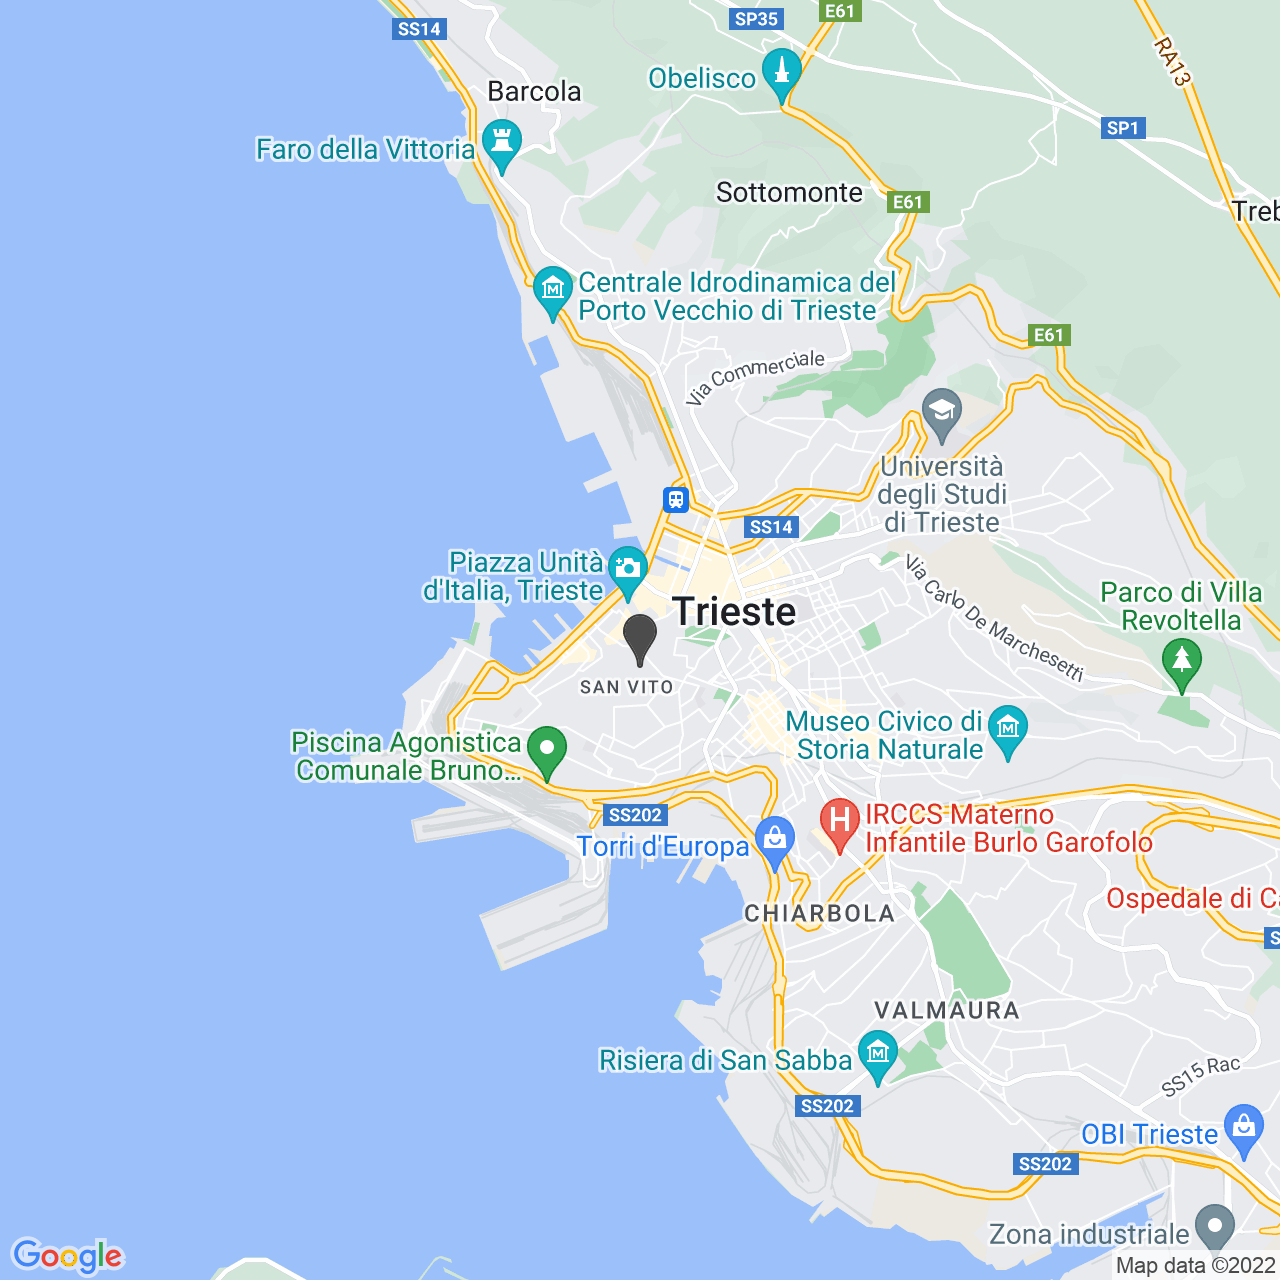 Chiesa Cristiana Evangelica TrE Triestevangelica